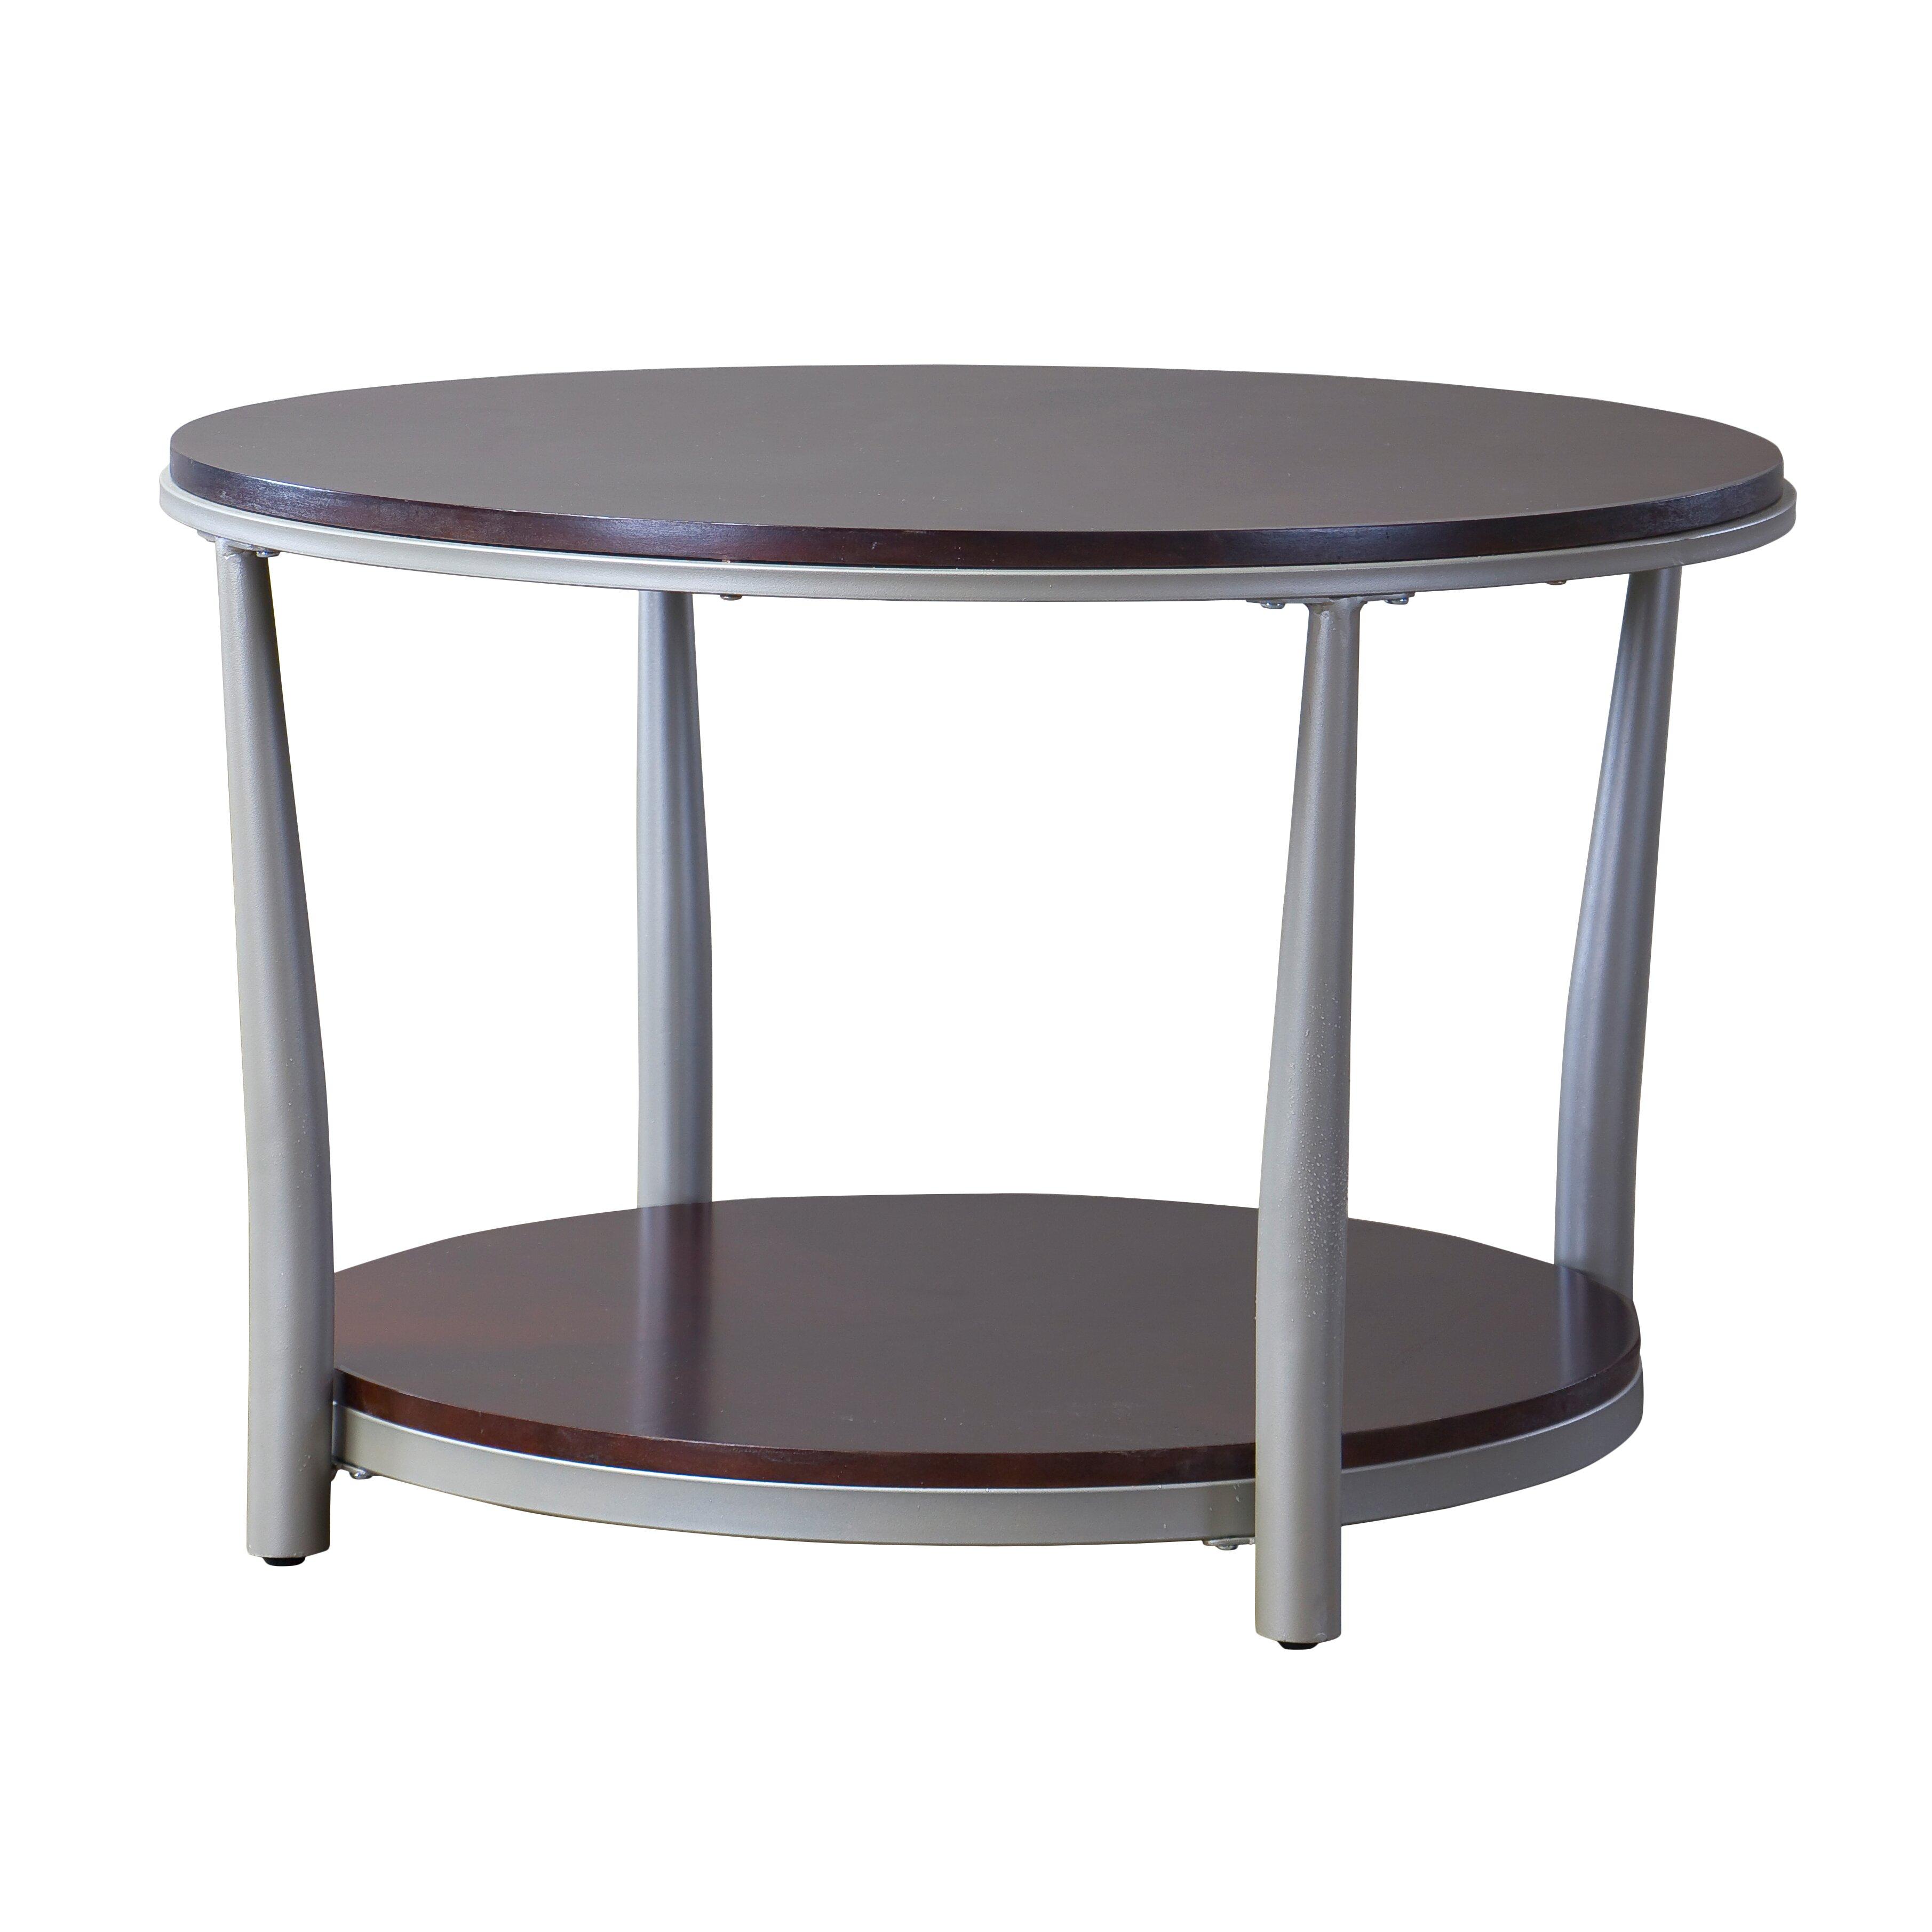 Https Www Wayfair Com Halo Coffee Table Ylx 2667 Ct Whi5912 Html